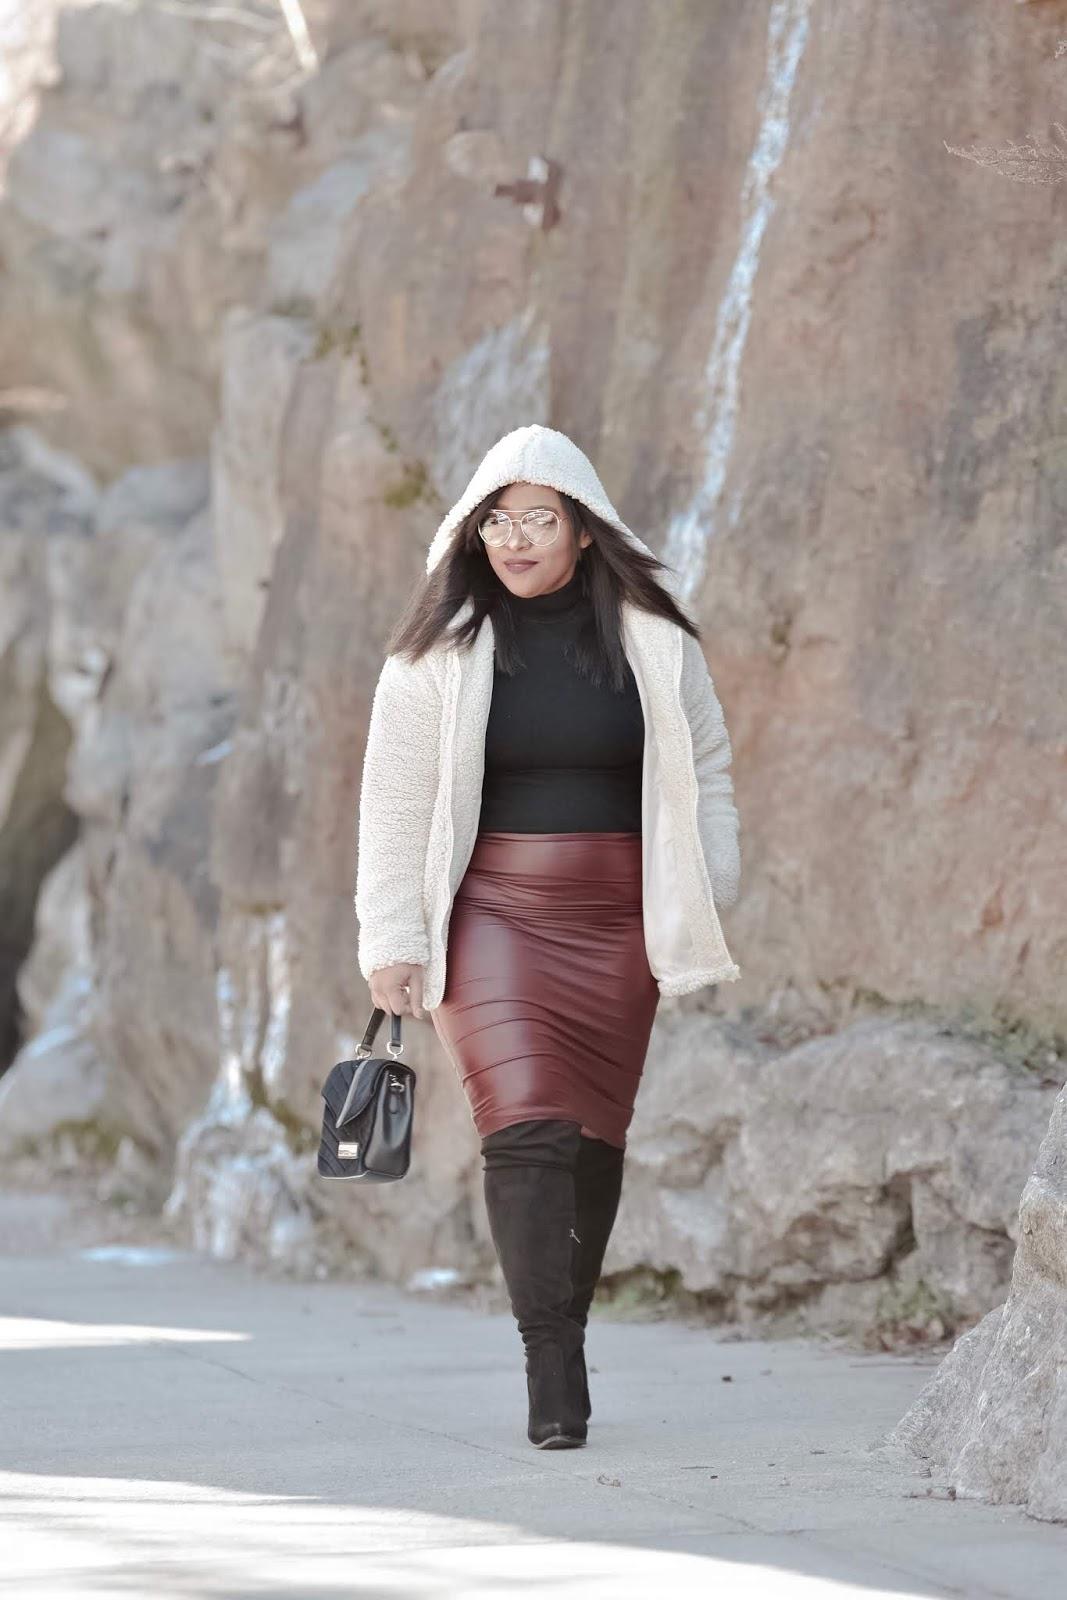 nyfw, fashion week, nyfw streetstyle, nyfw trends, nyfw 2019